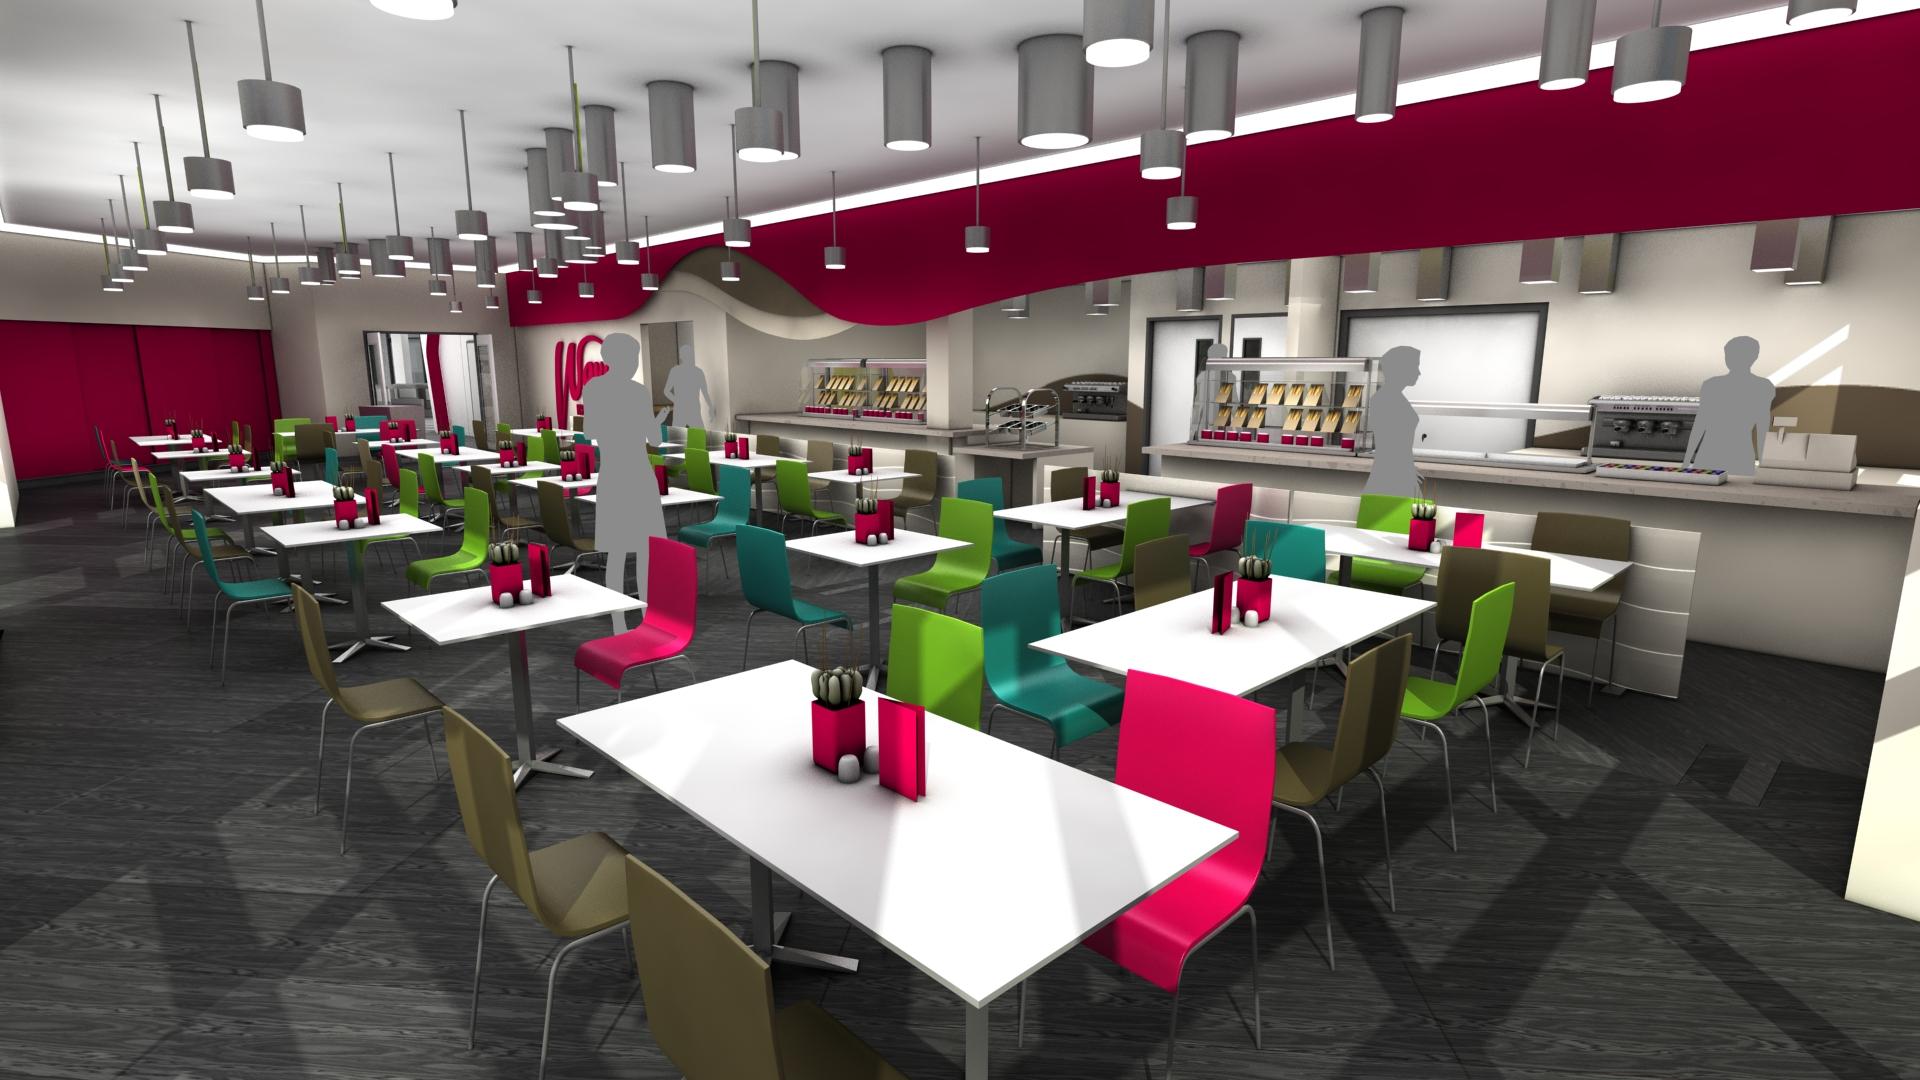 South Essex College Architectural 3D Render-19.jpg